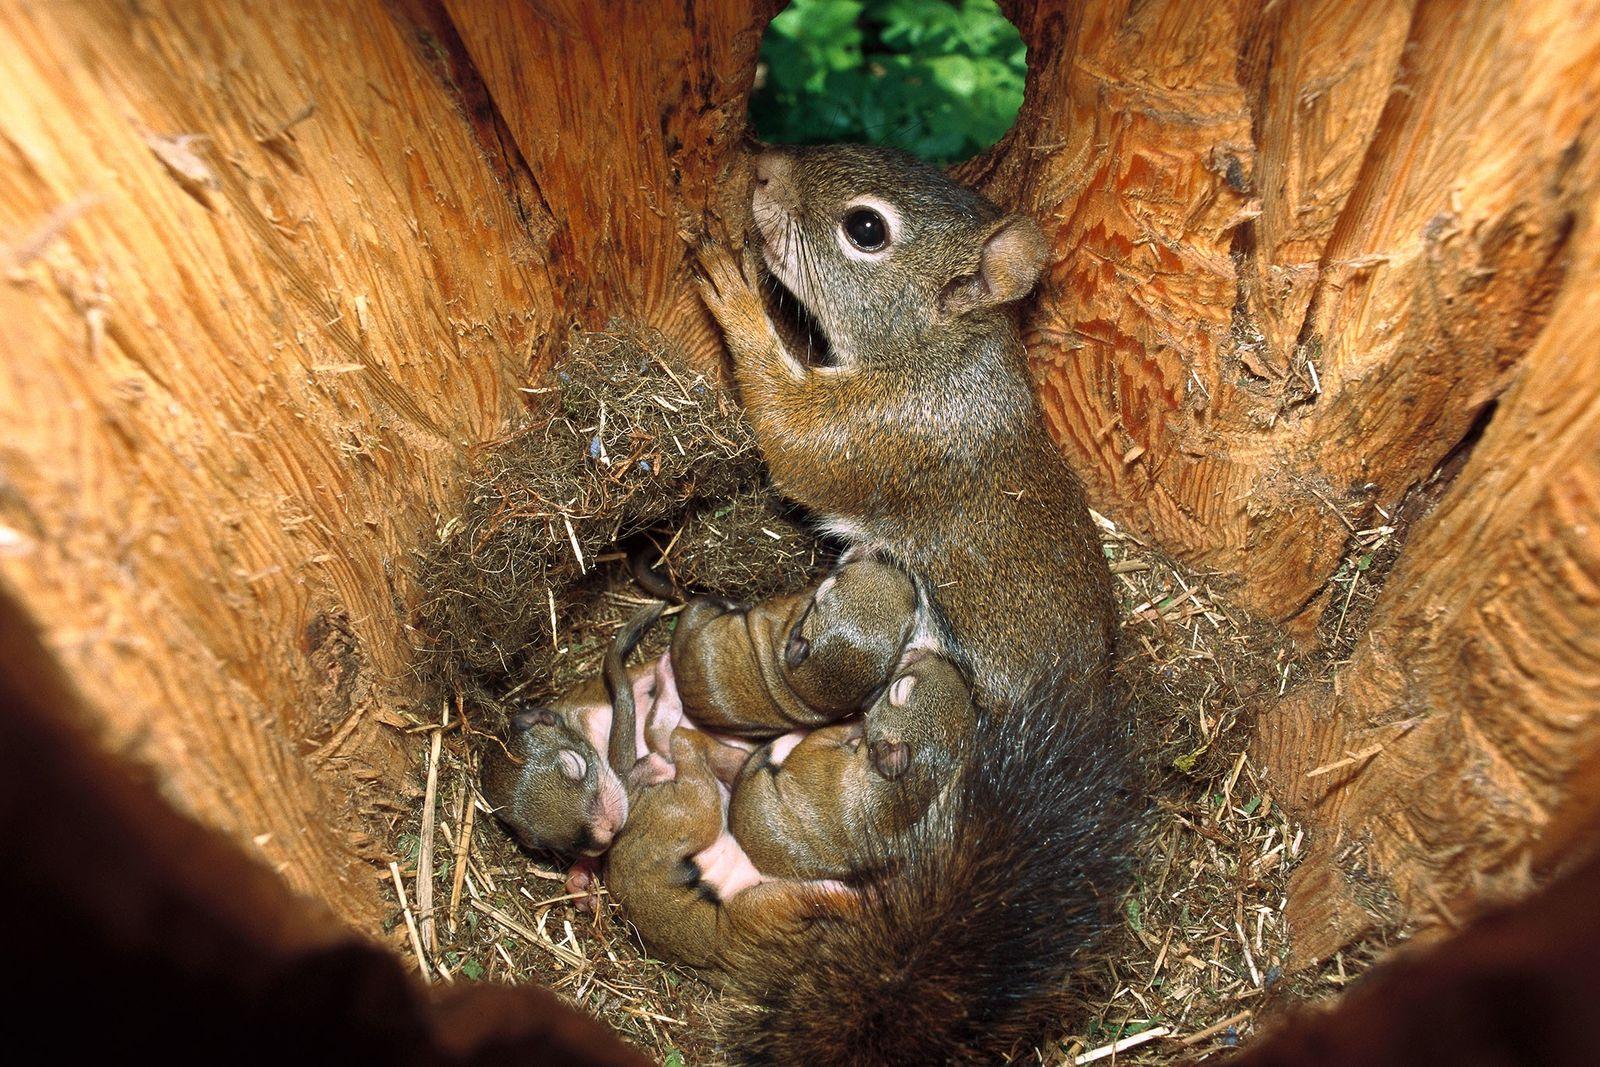 Viral Squirrel Photo Sparks Anatomy Discussion